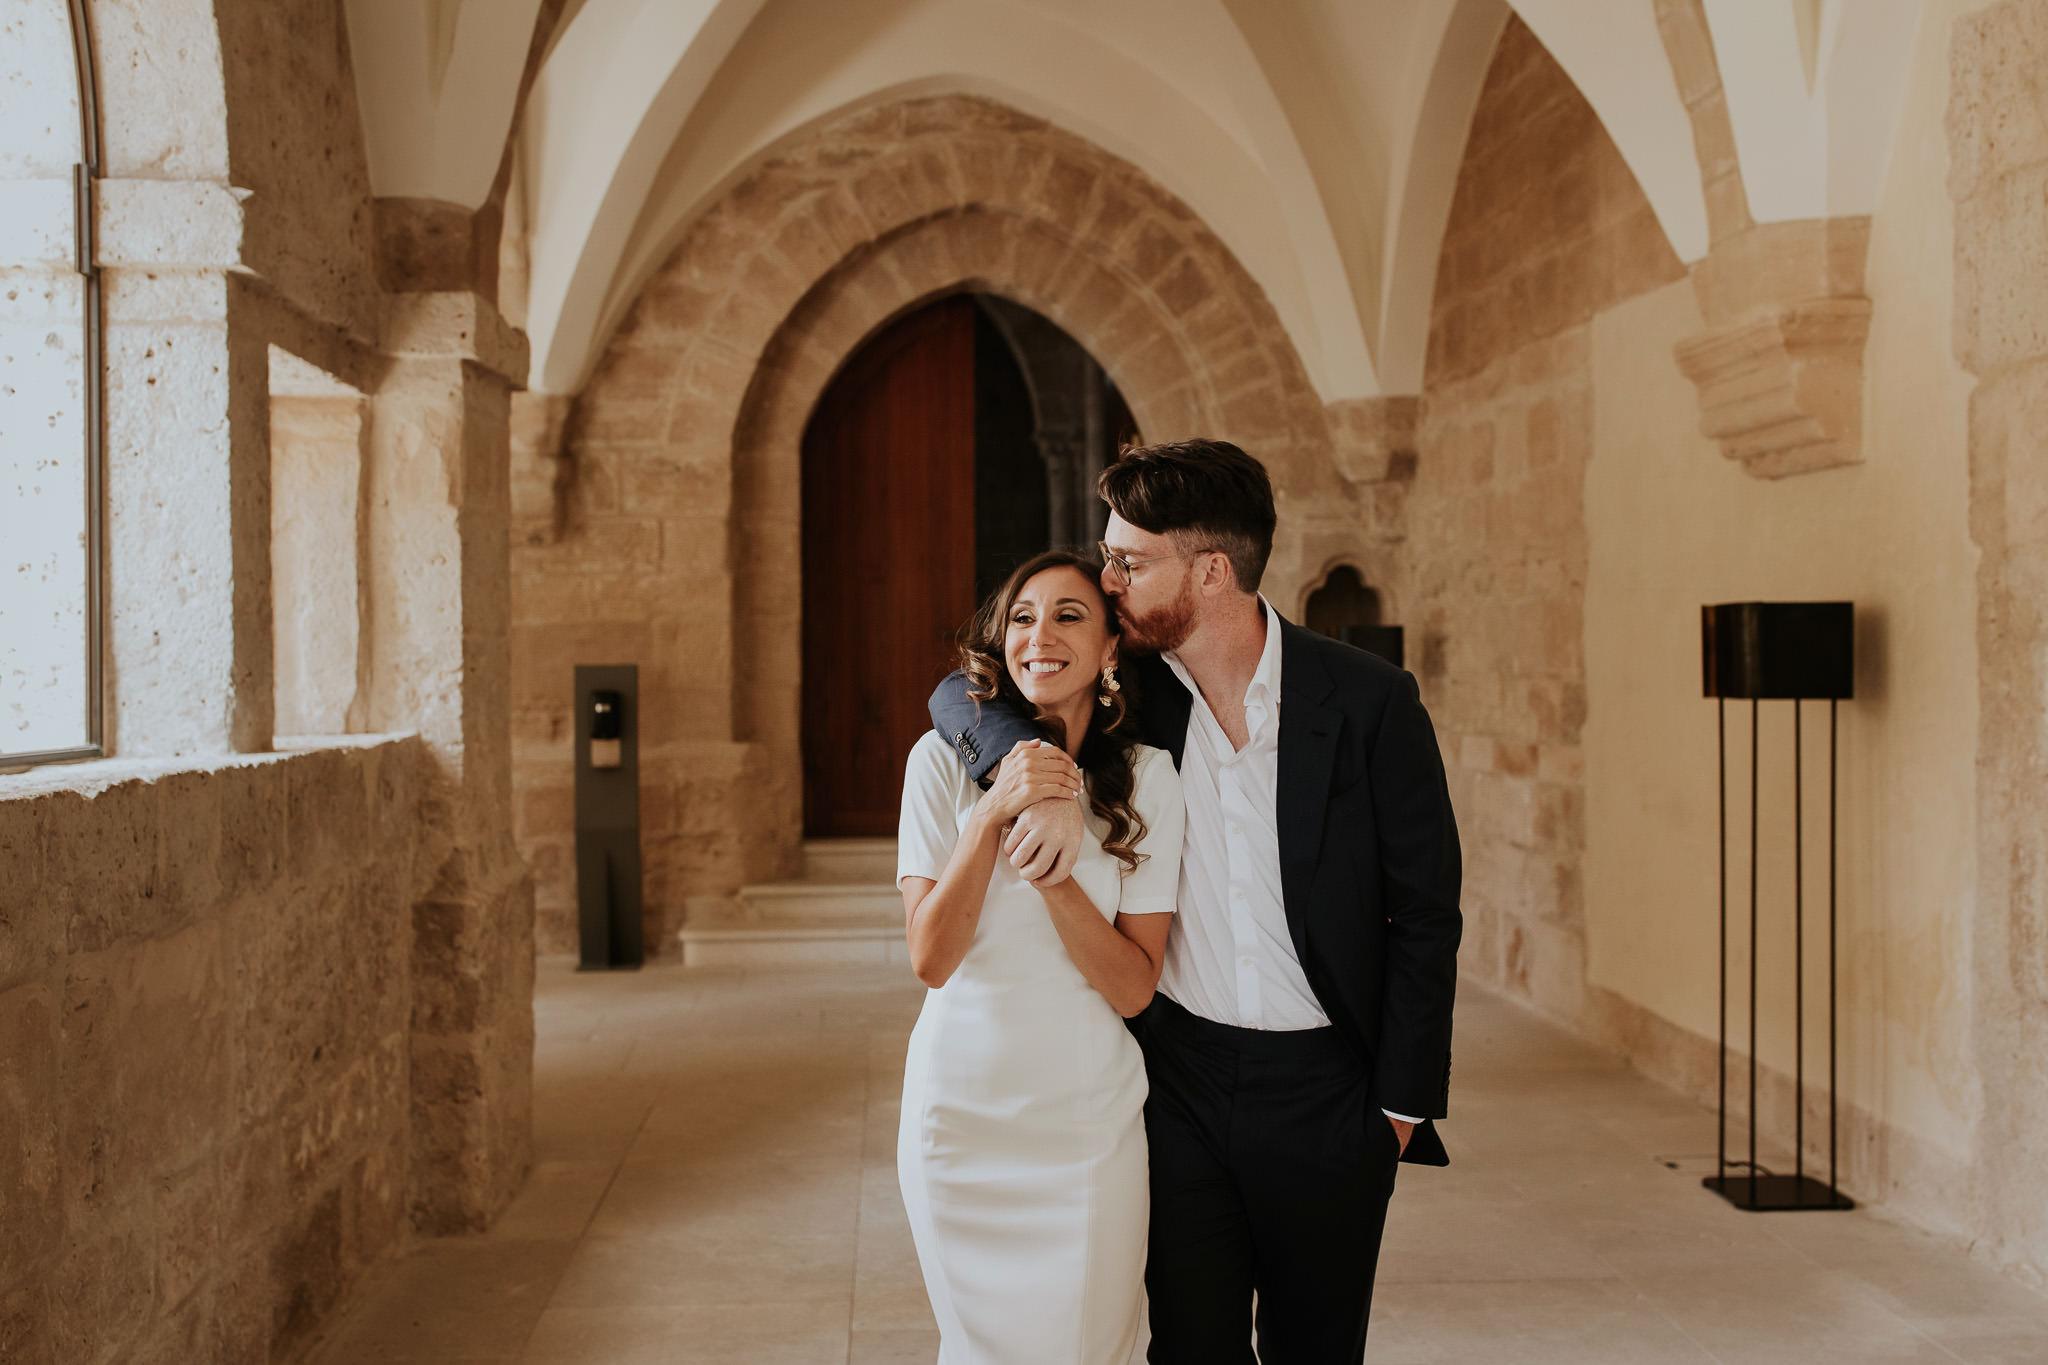 bodas en abadia retuerta